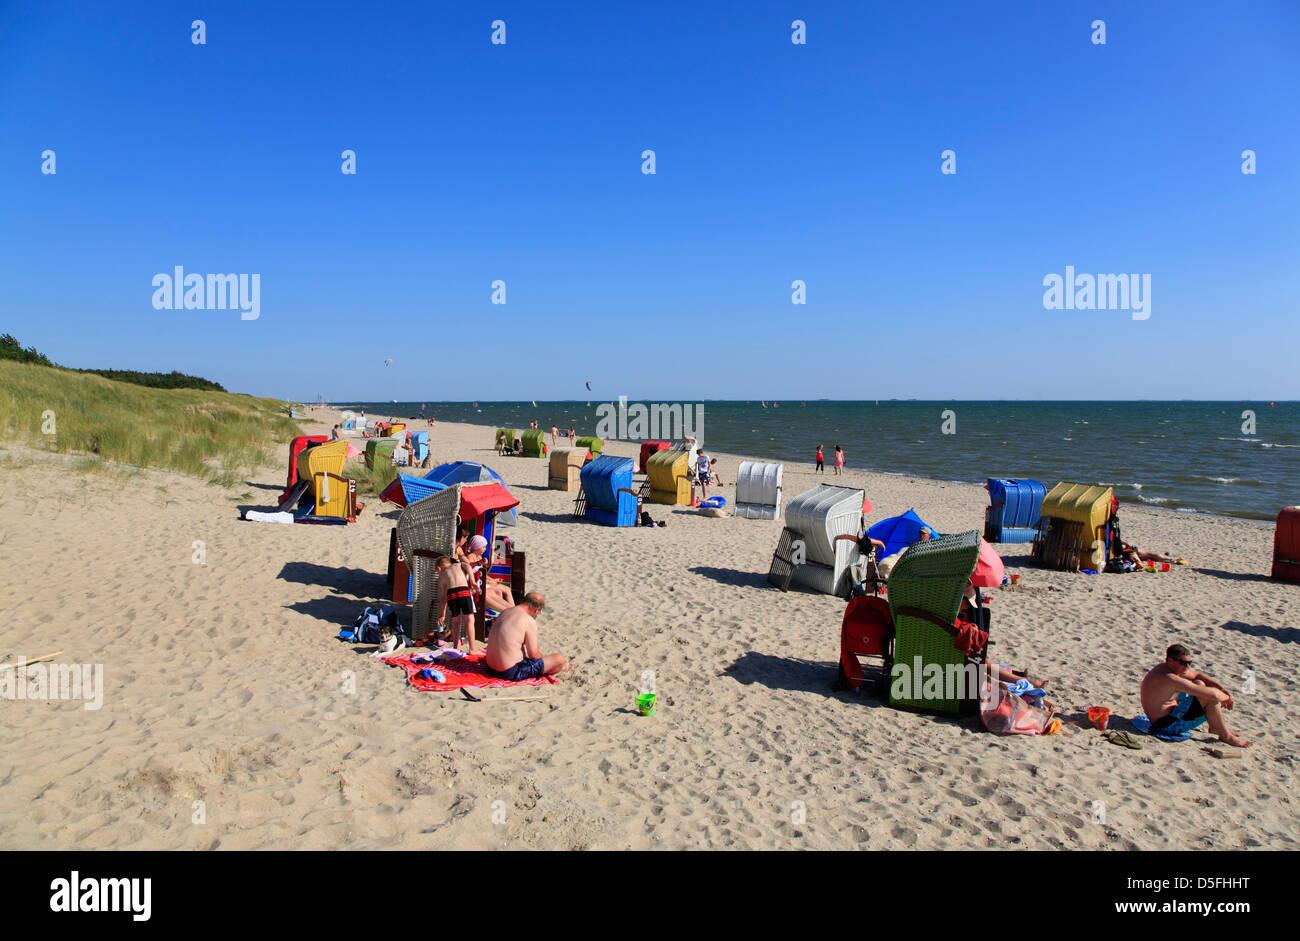 Foehr Island, Nieblum beach, Schleswig-Holstein, Germany - Stock Image